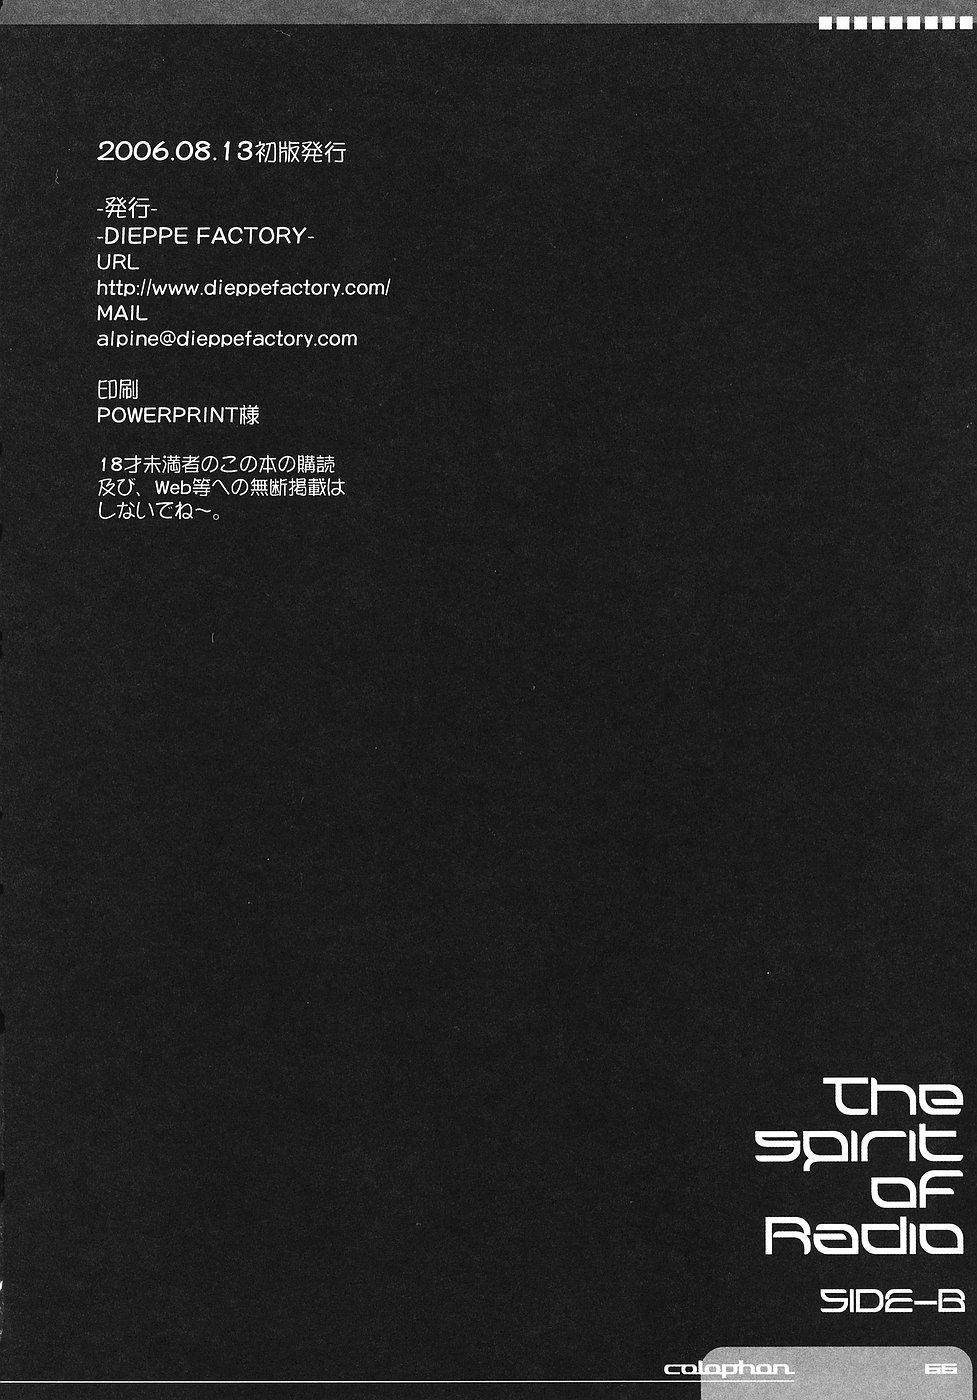 The Spirit Of Radio SIDE-B 64